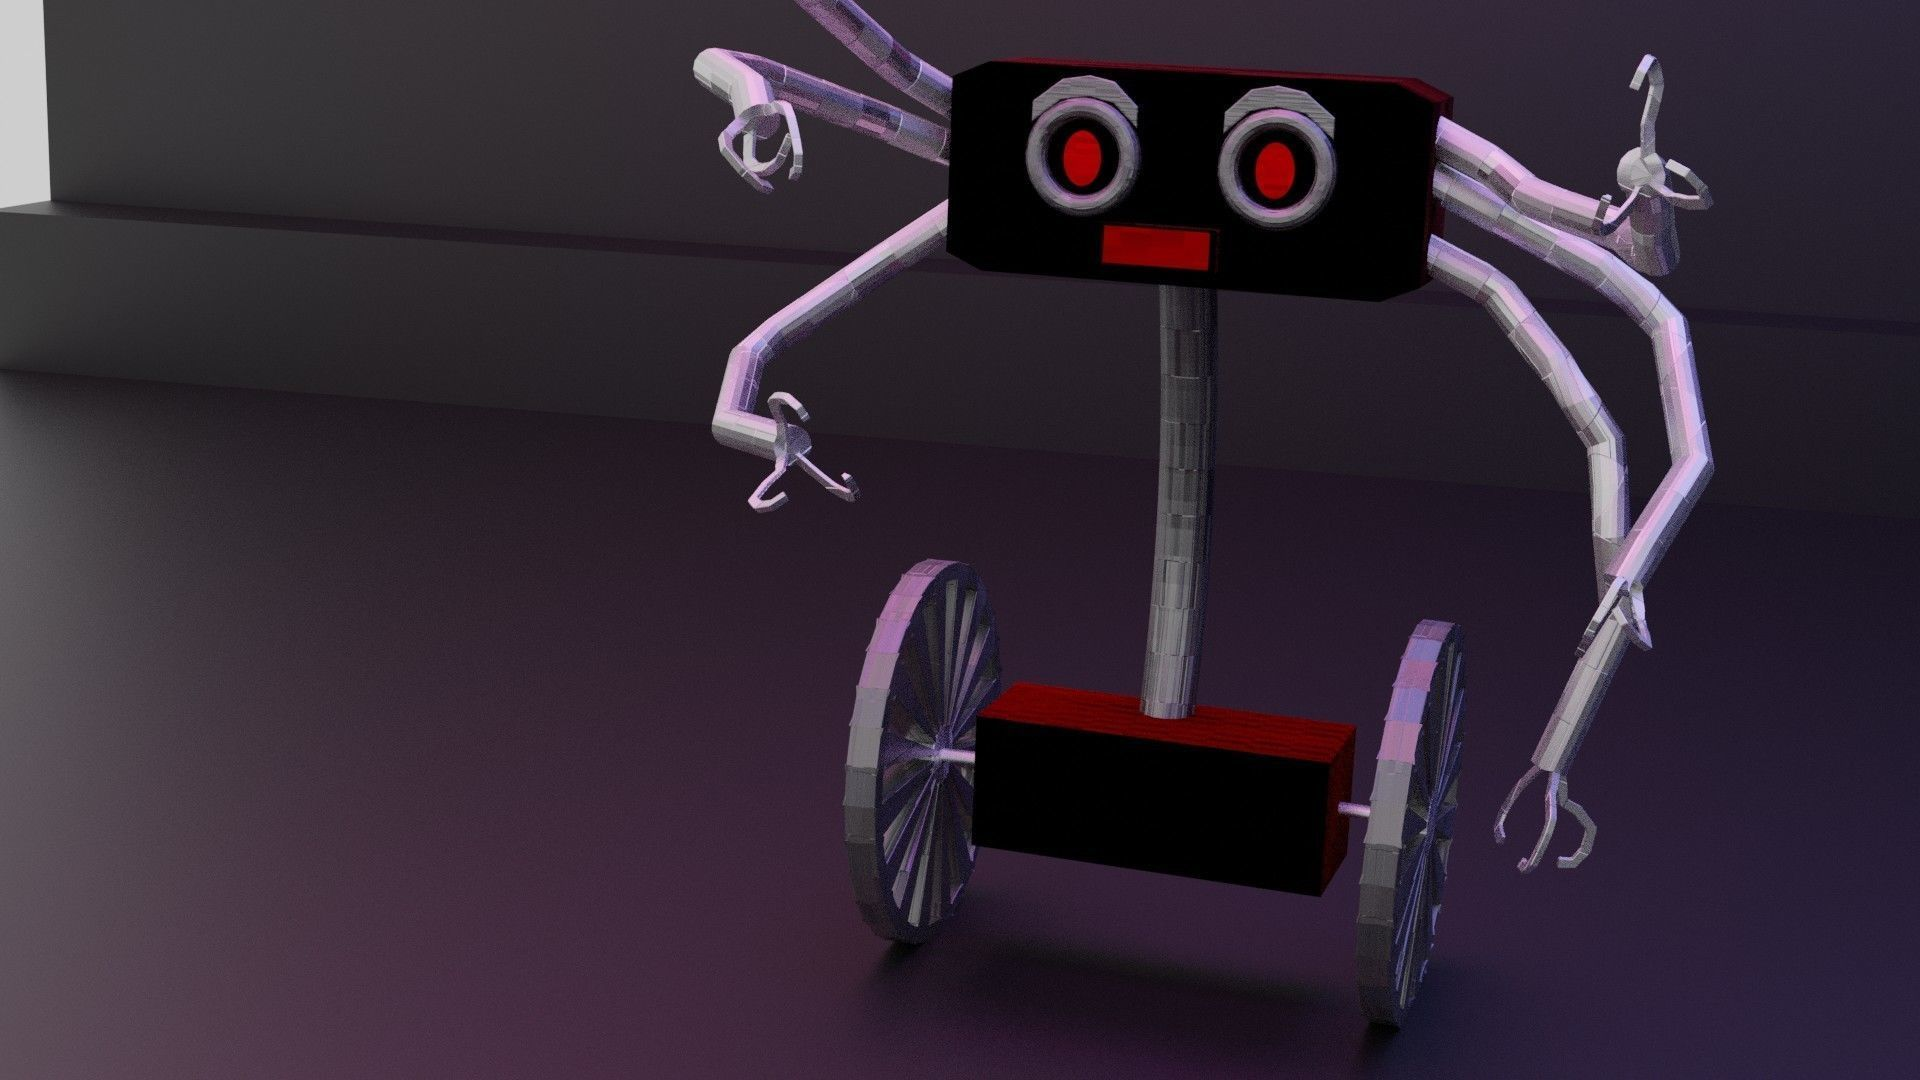 A sci-fi robot game-ready cartoon themed